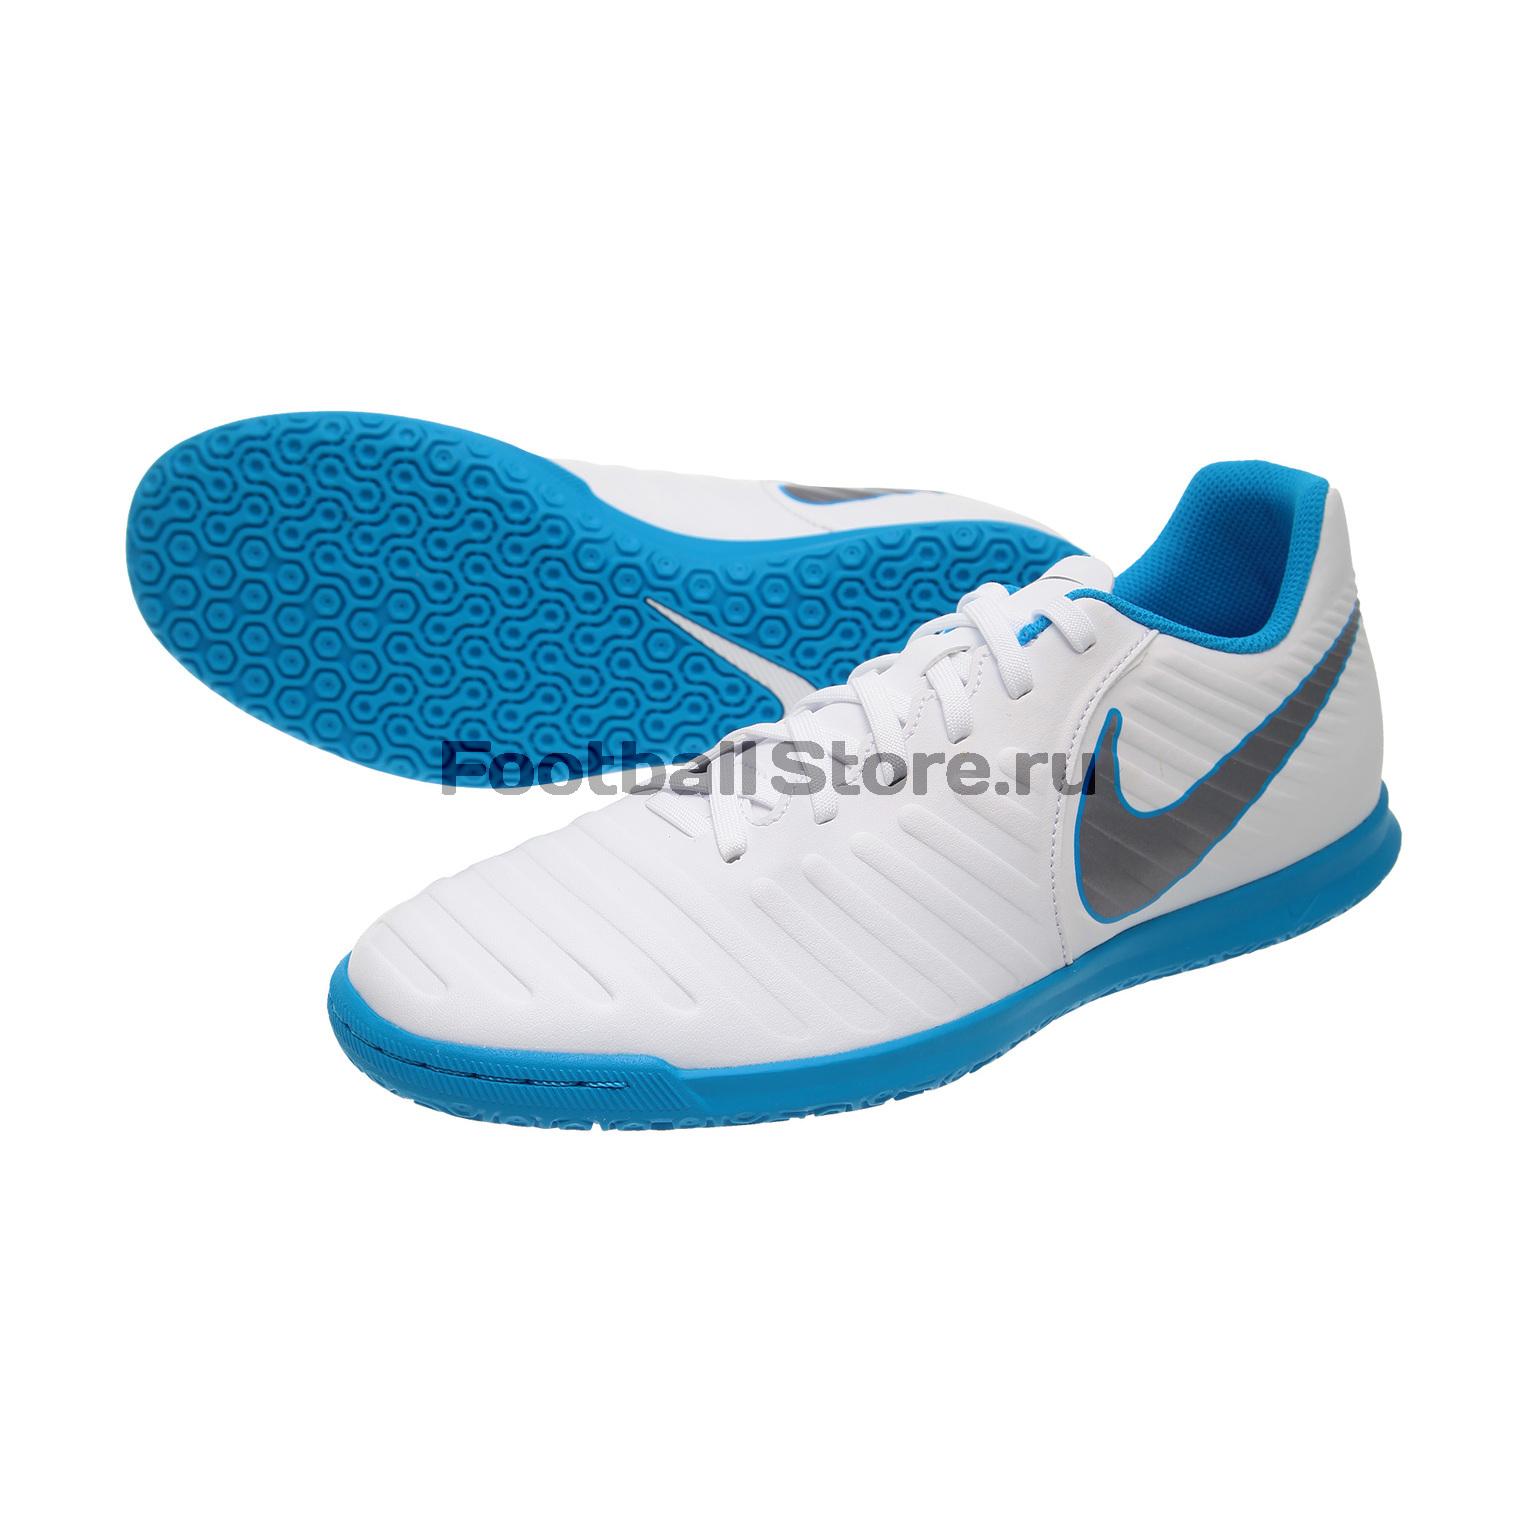 Обувь для зала Nike LegendX 7 Club IC AH7245-107 шиповки nike legendx 7 club tf ah7248 107